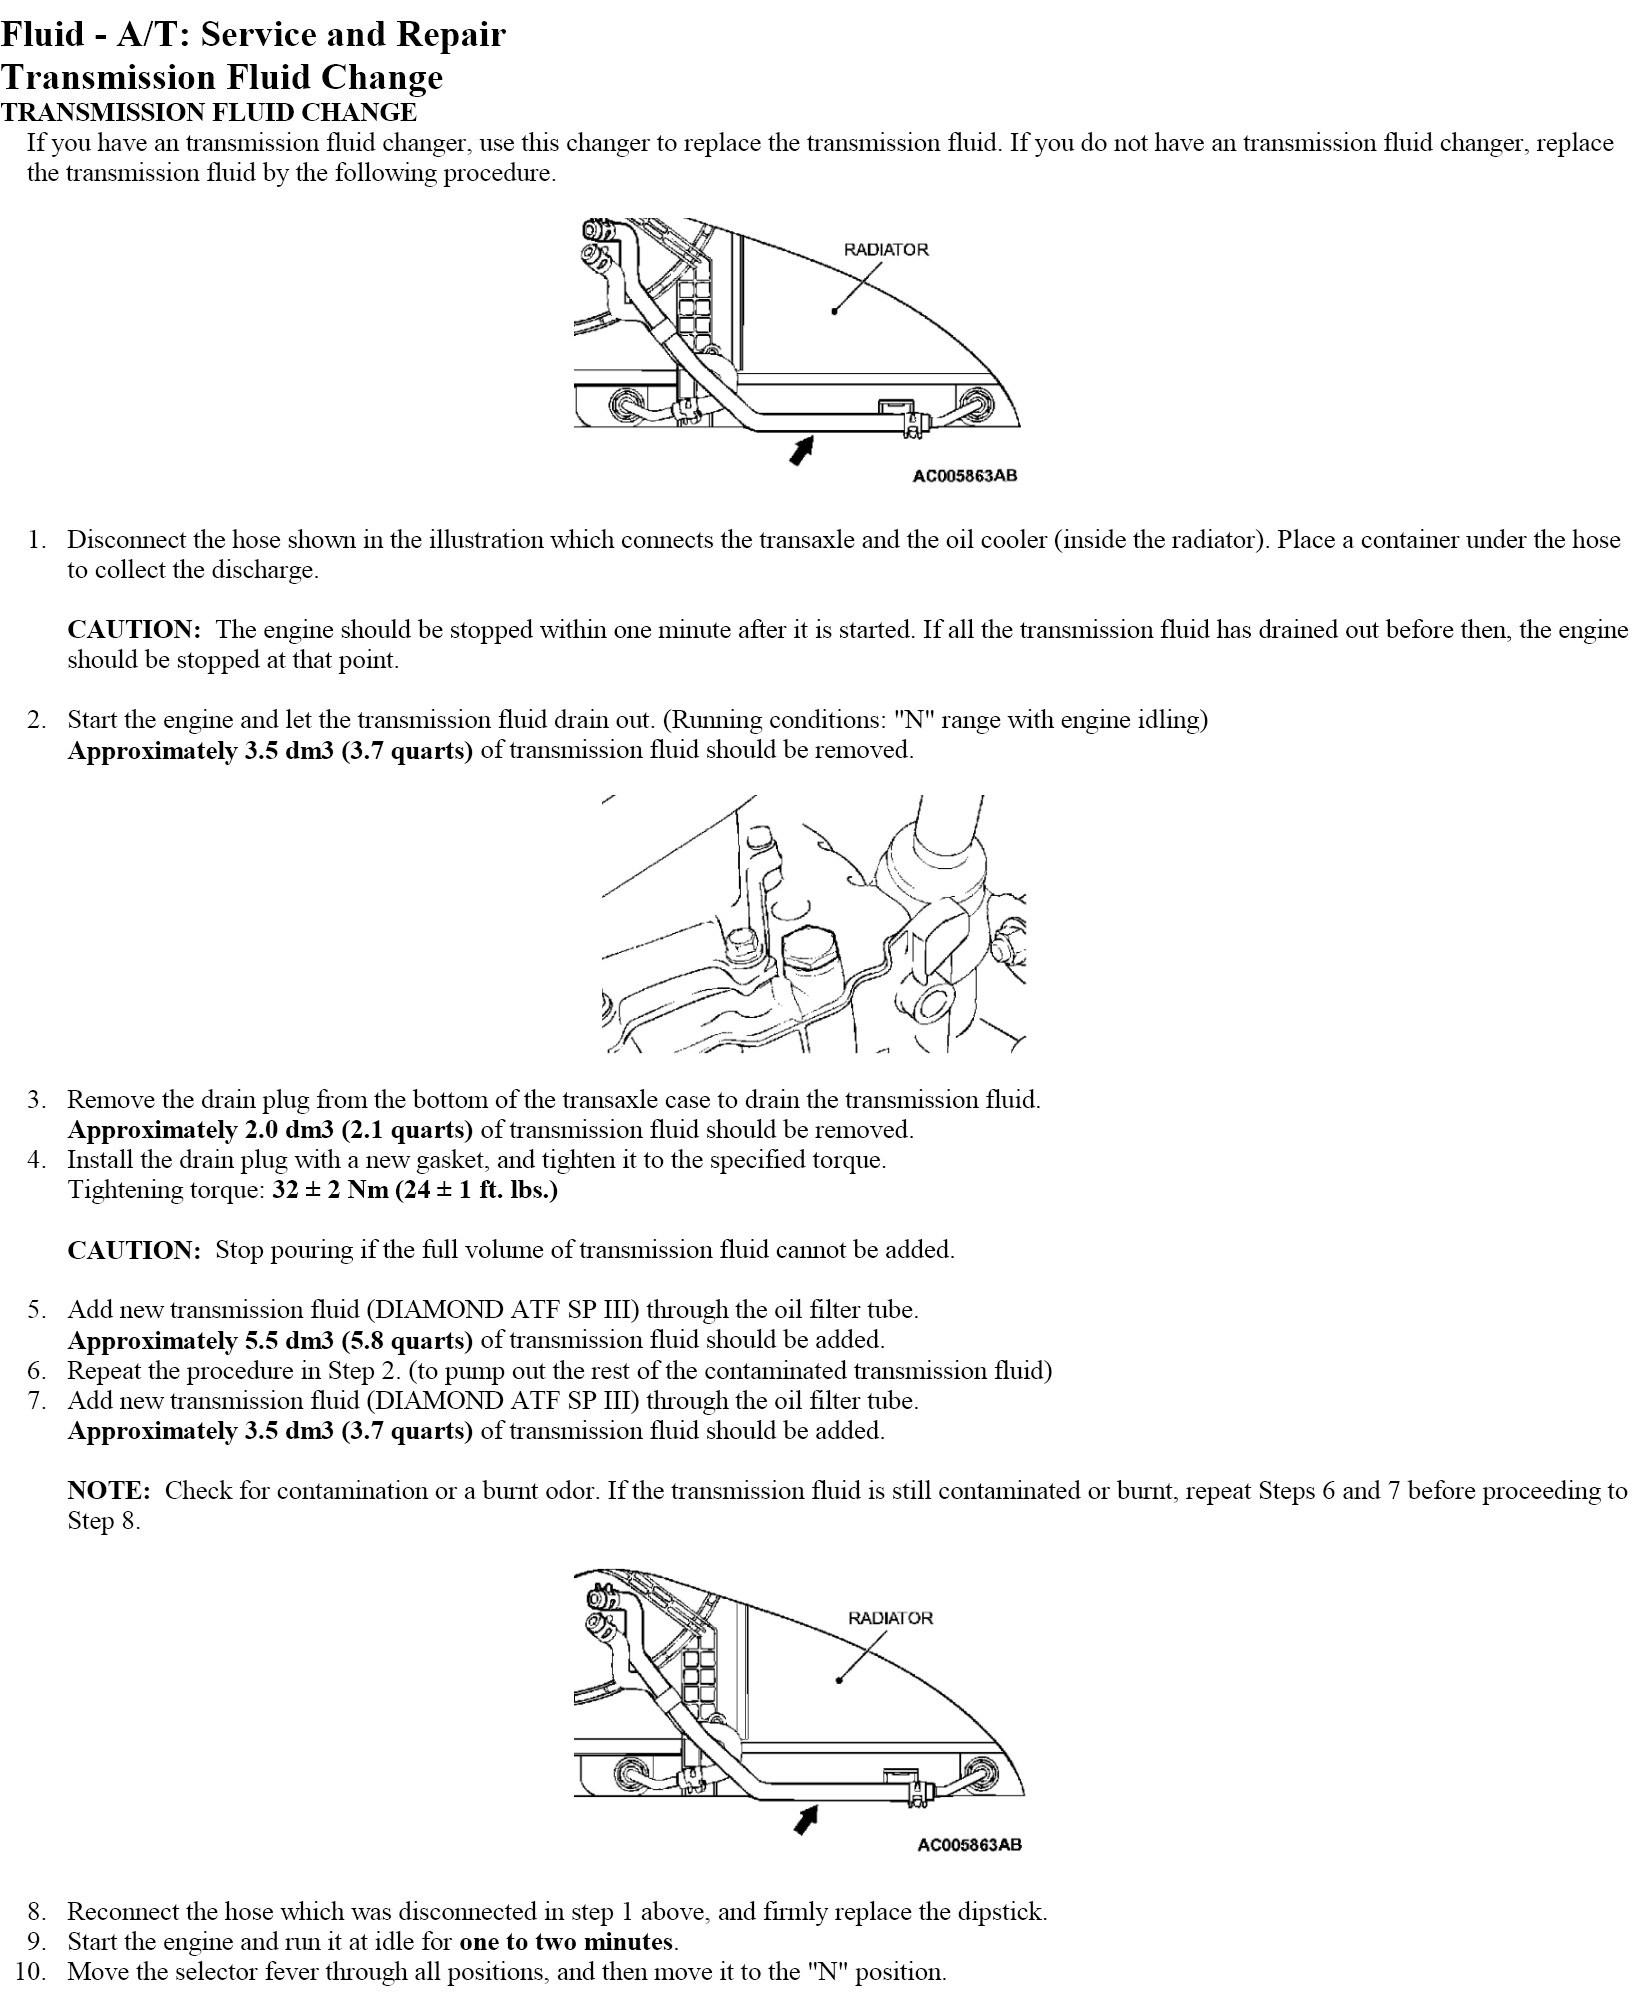 Transmission Fluid Change: 2002 Mitsubishi Lancer Manual Transmission Fluid Change